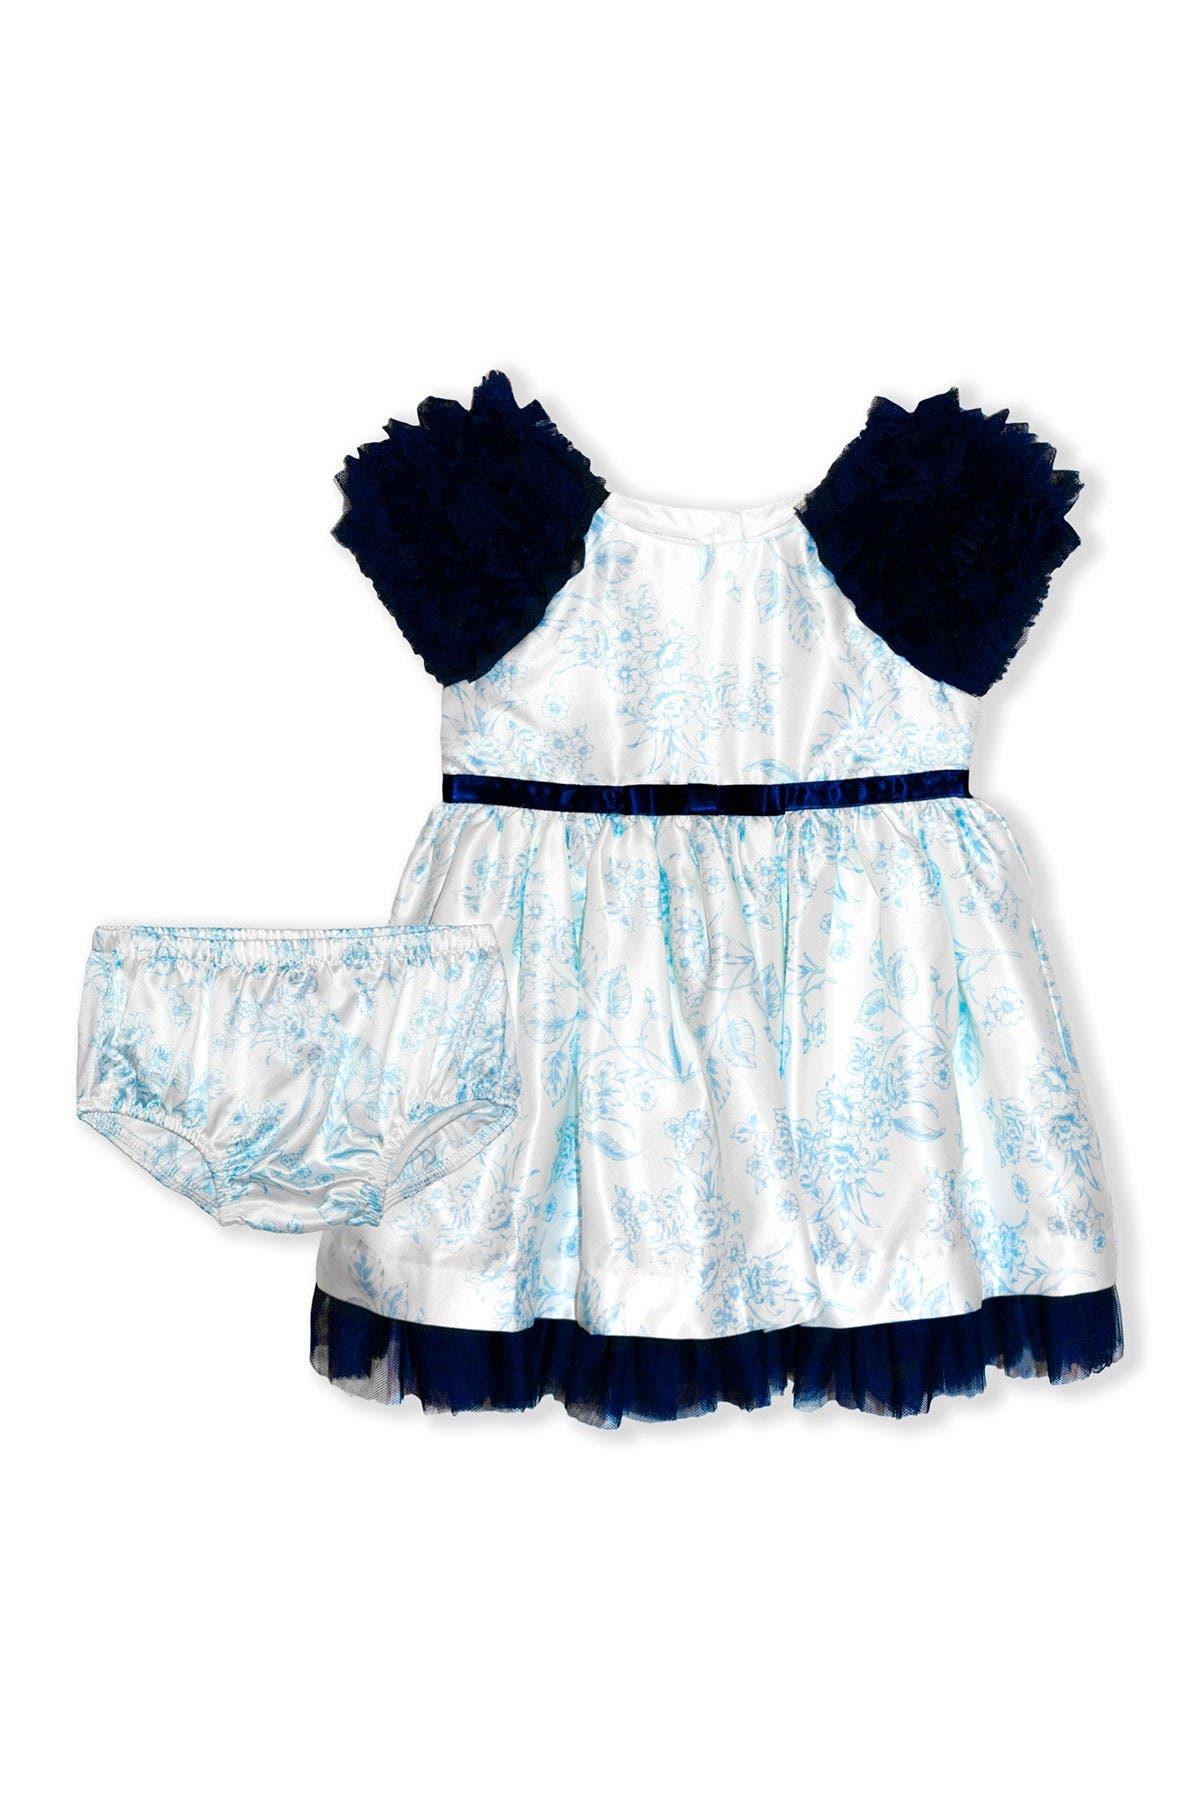 Image of BISCOTTI Floral Satin 2-Piece Dress & Bloomer Set